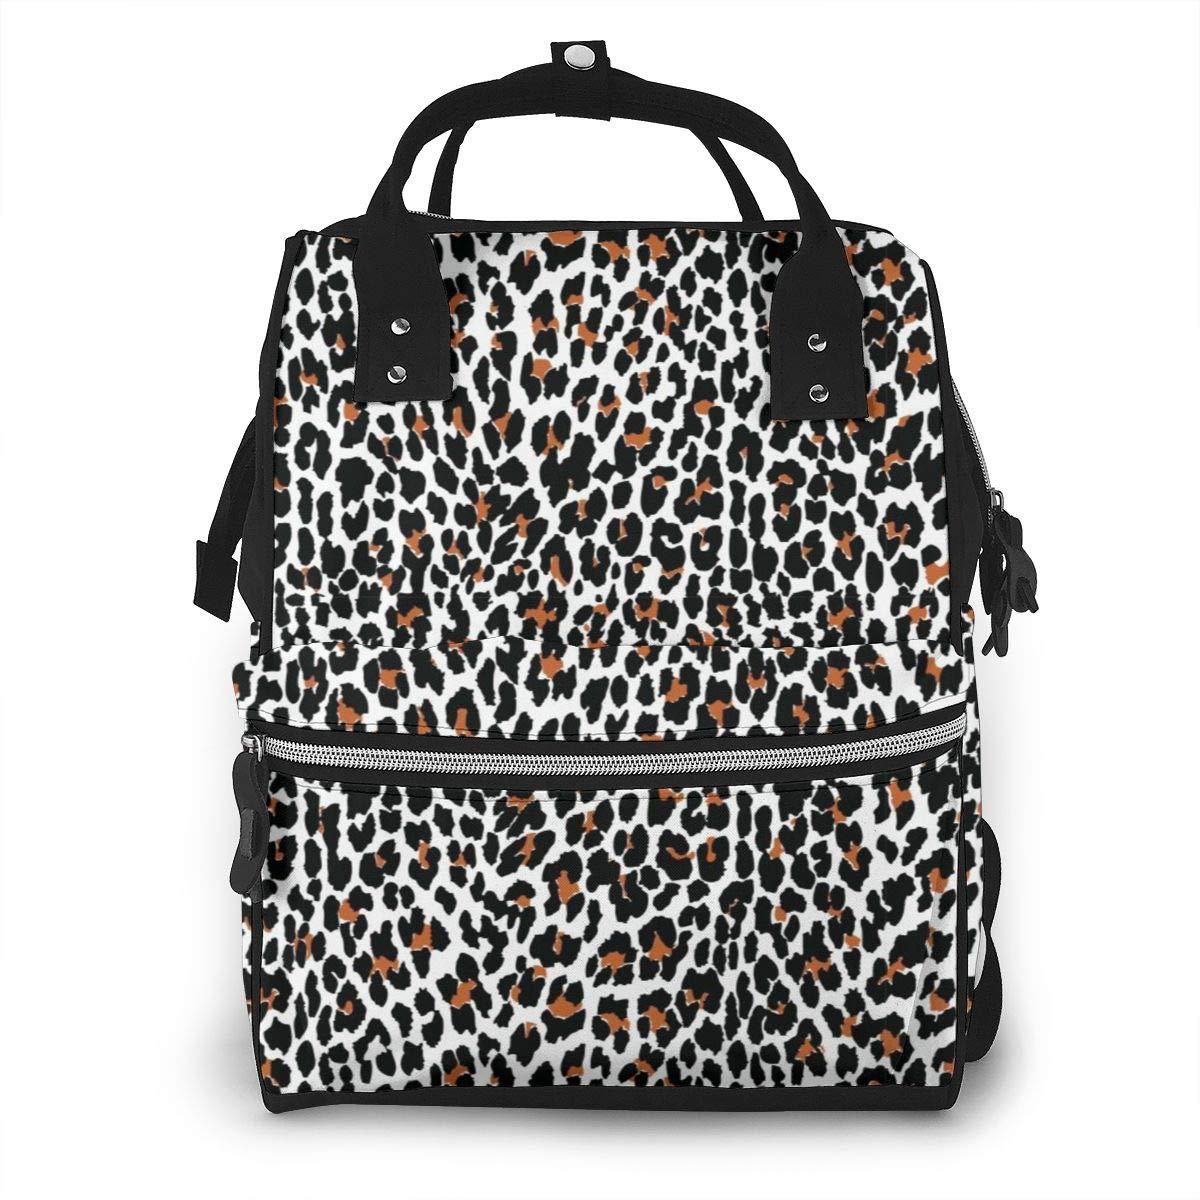 Leopard PrintDiaper Bag Bookbag School Shoulder Multi Functional Stylish Large Backpack Capacity Nappy Bags Mummy Durable Travel